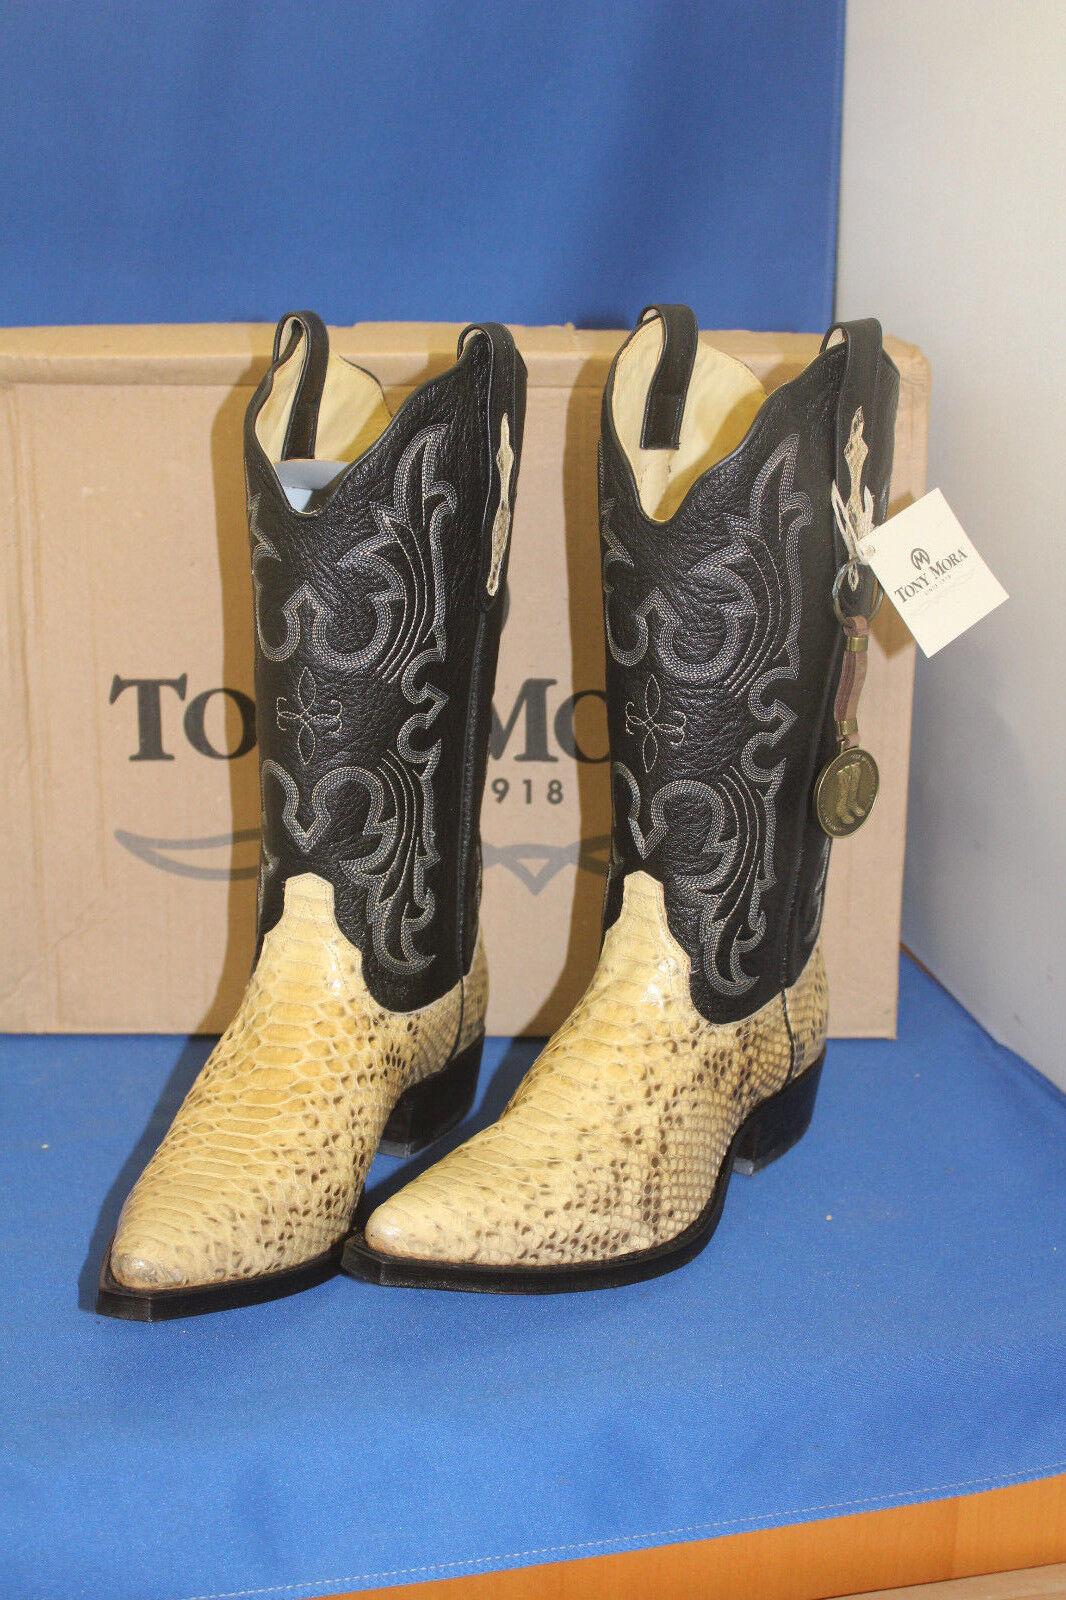 Sendra Stiefel Stiefel python  westernstiefel cowboystiefel  gr. 42  neu snake